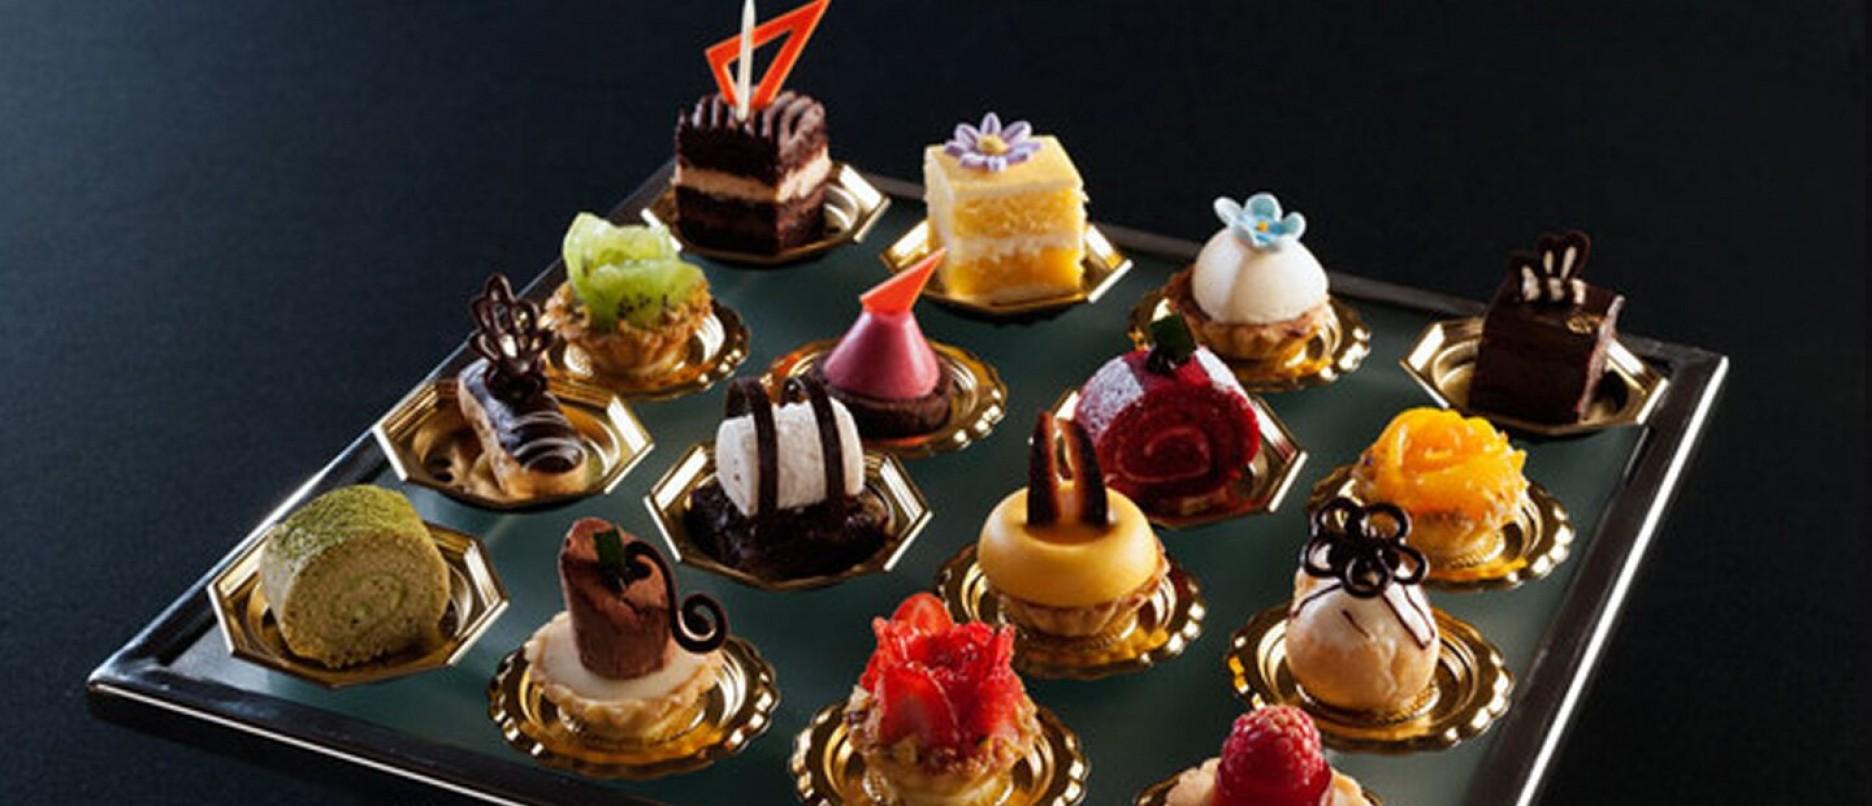 The Cake Shop 4